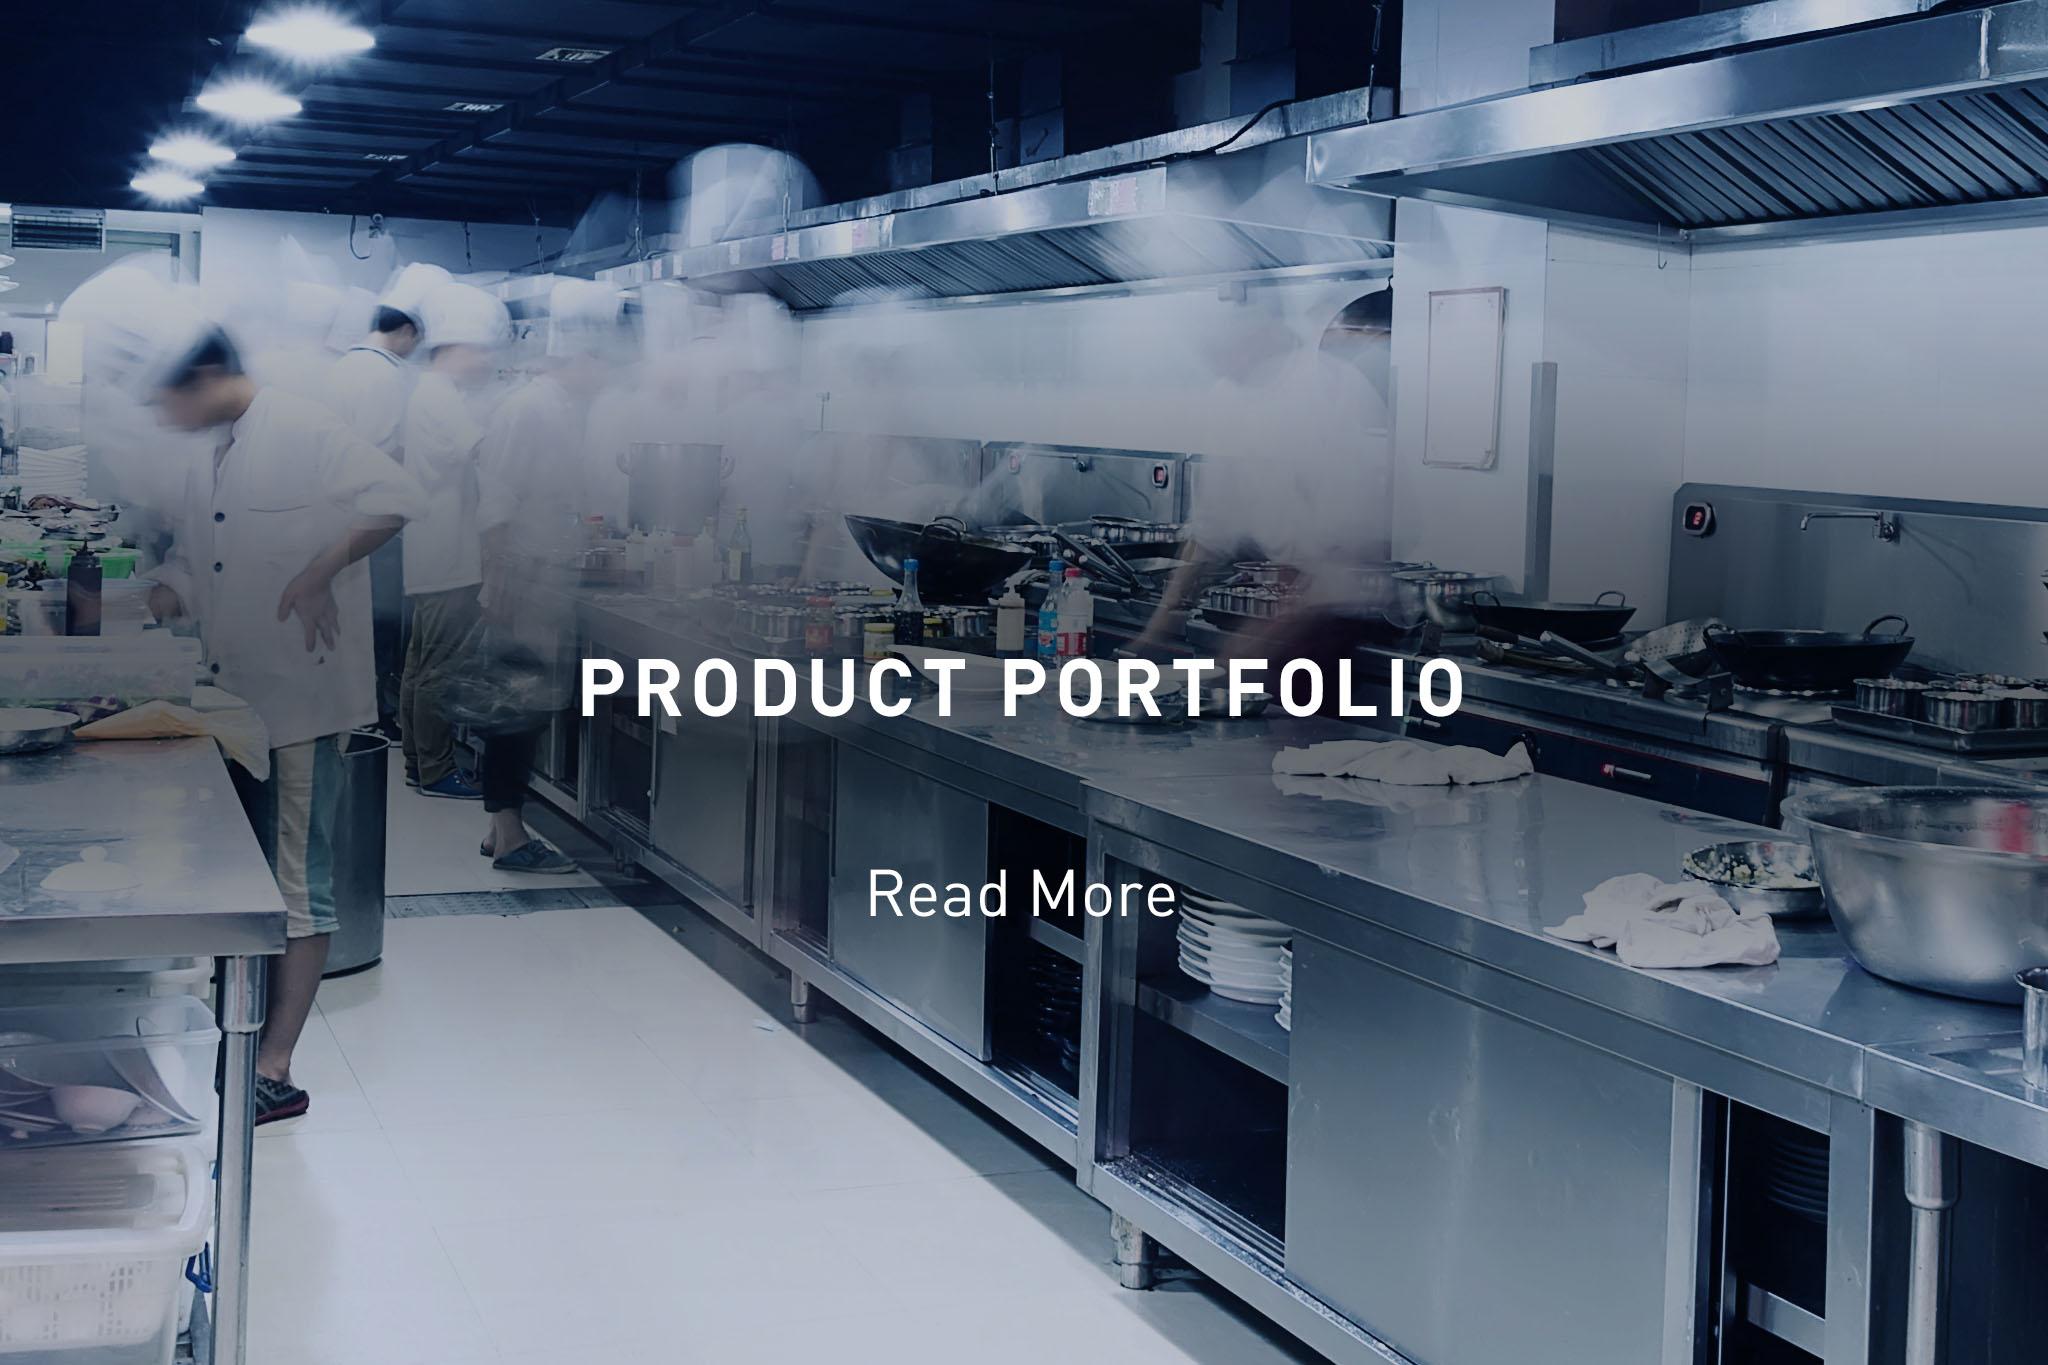 Product-Portfolio.jpg